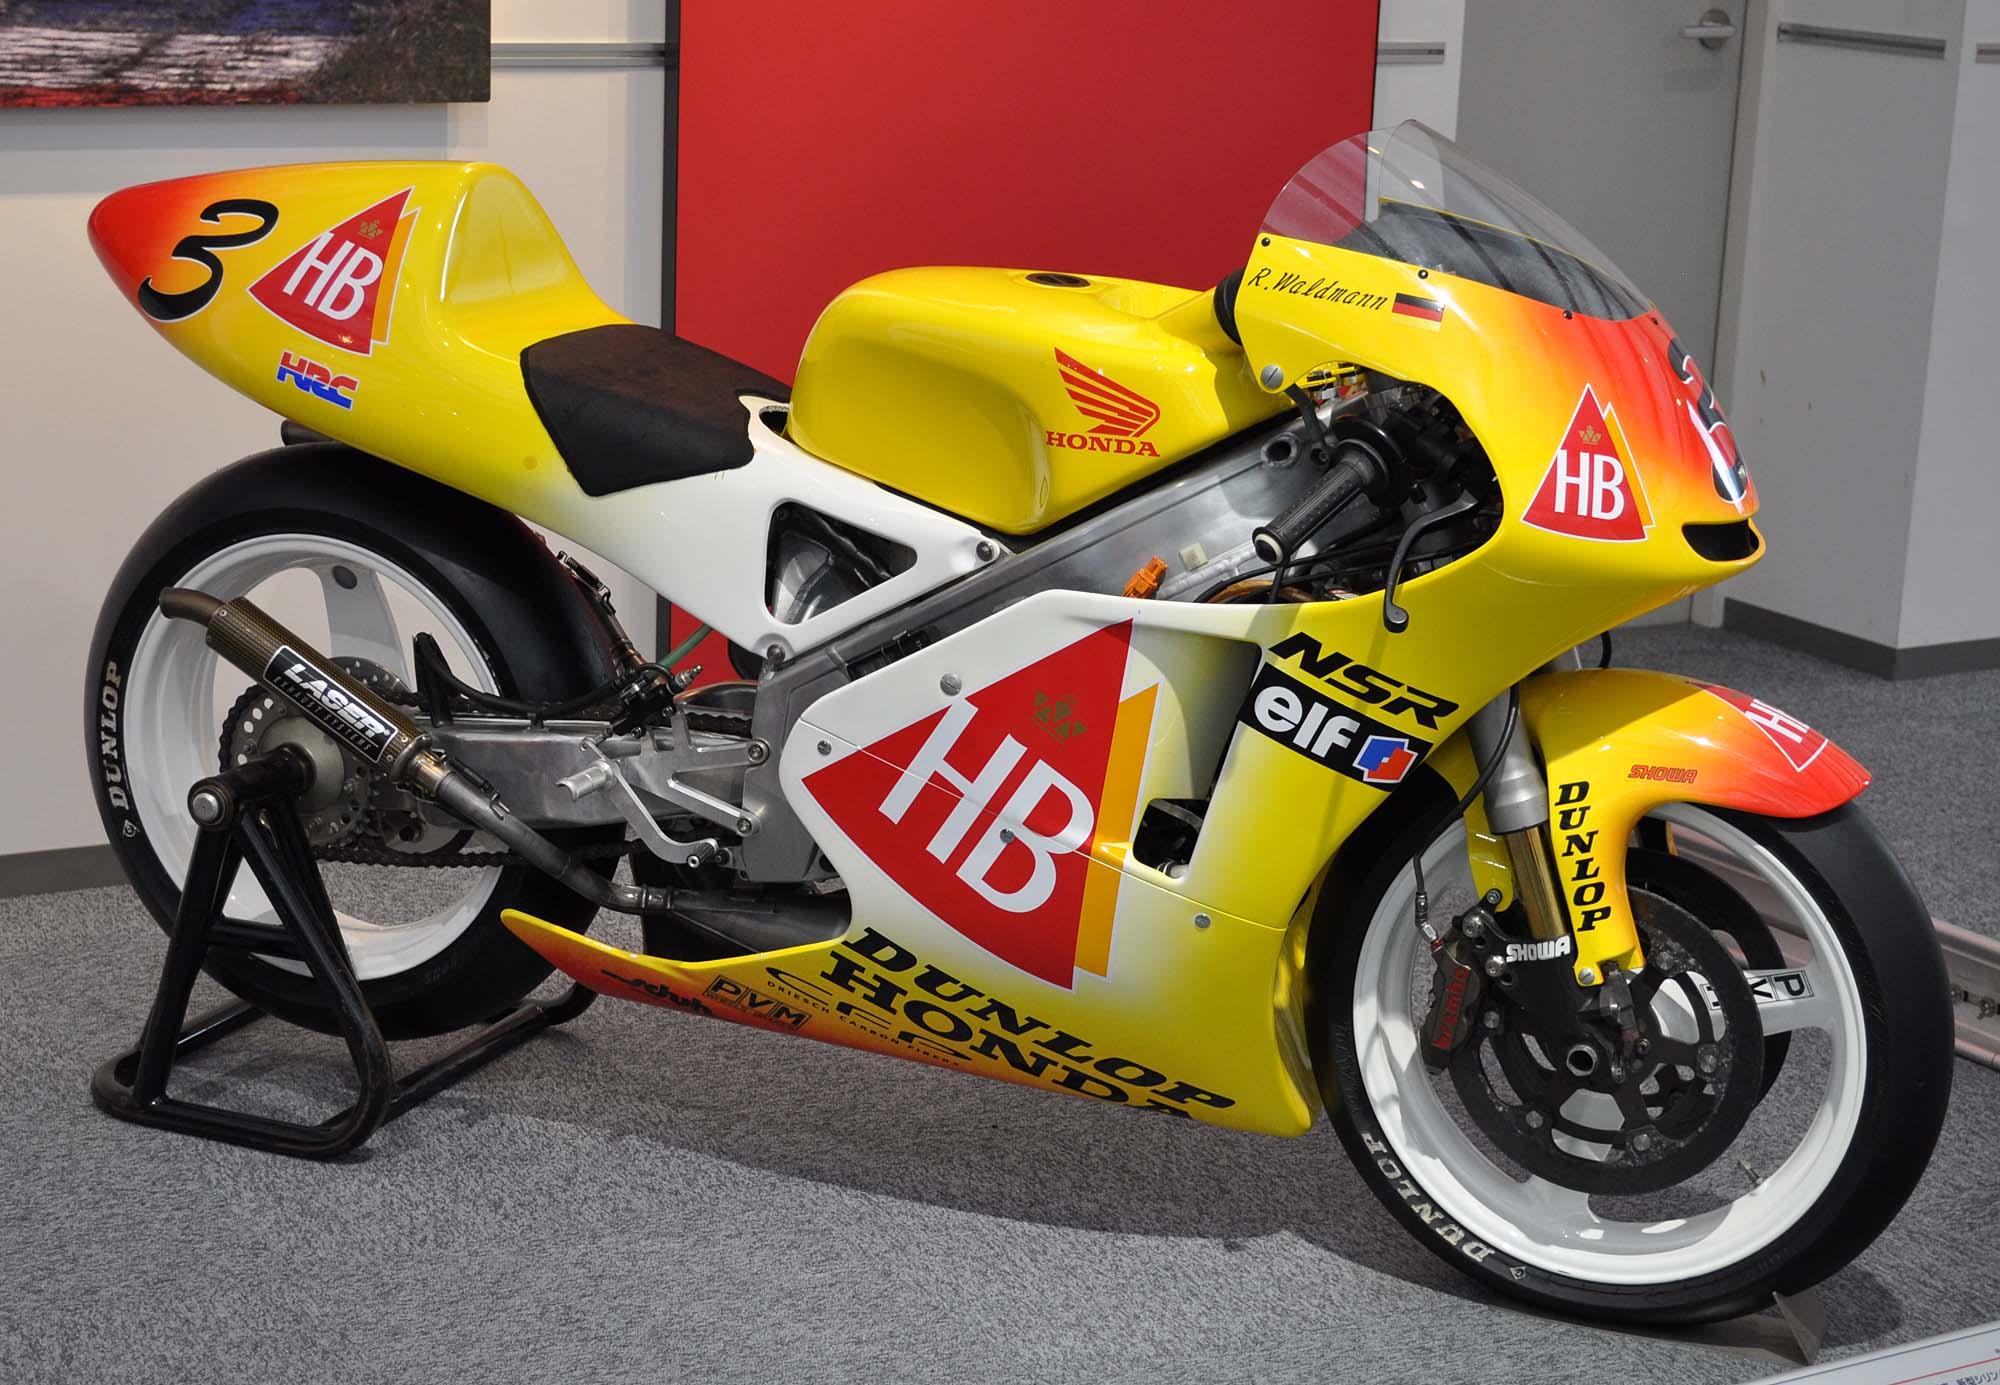 Build Your Own Honda >> File:Honda NSR250 1996.jpg - Wikimedia Commons